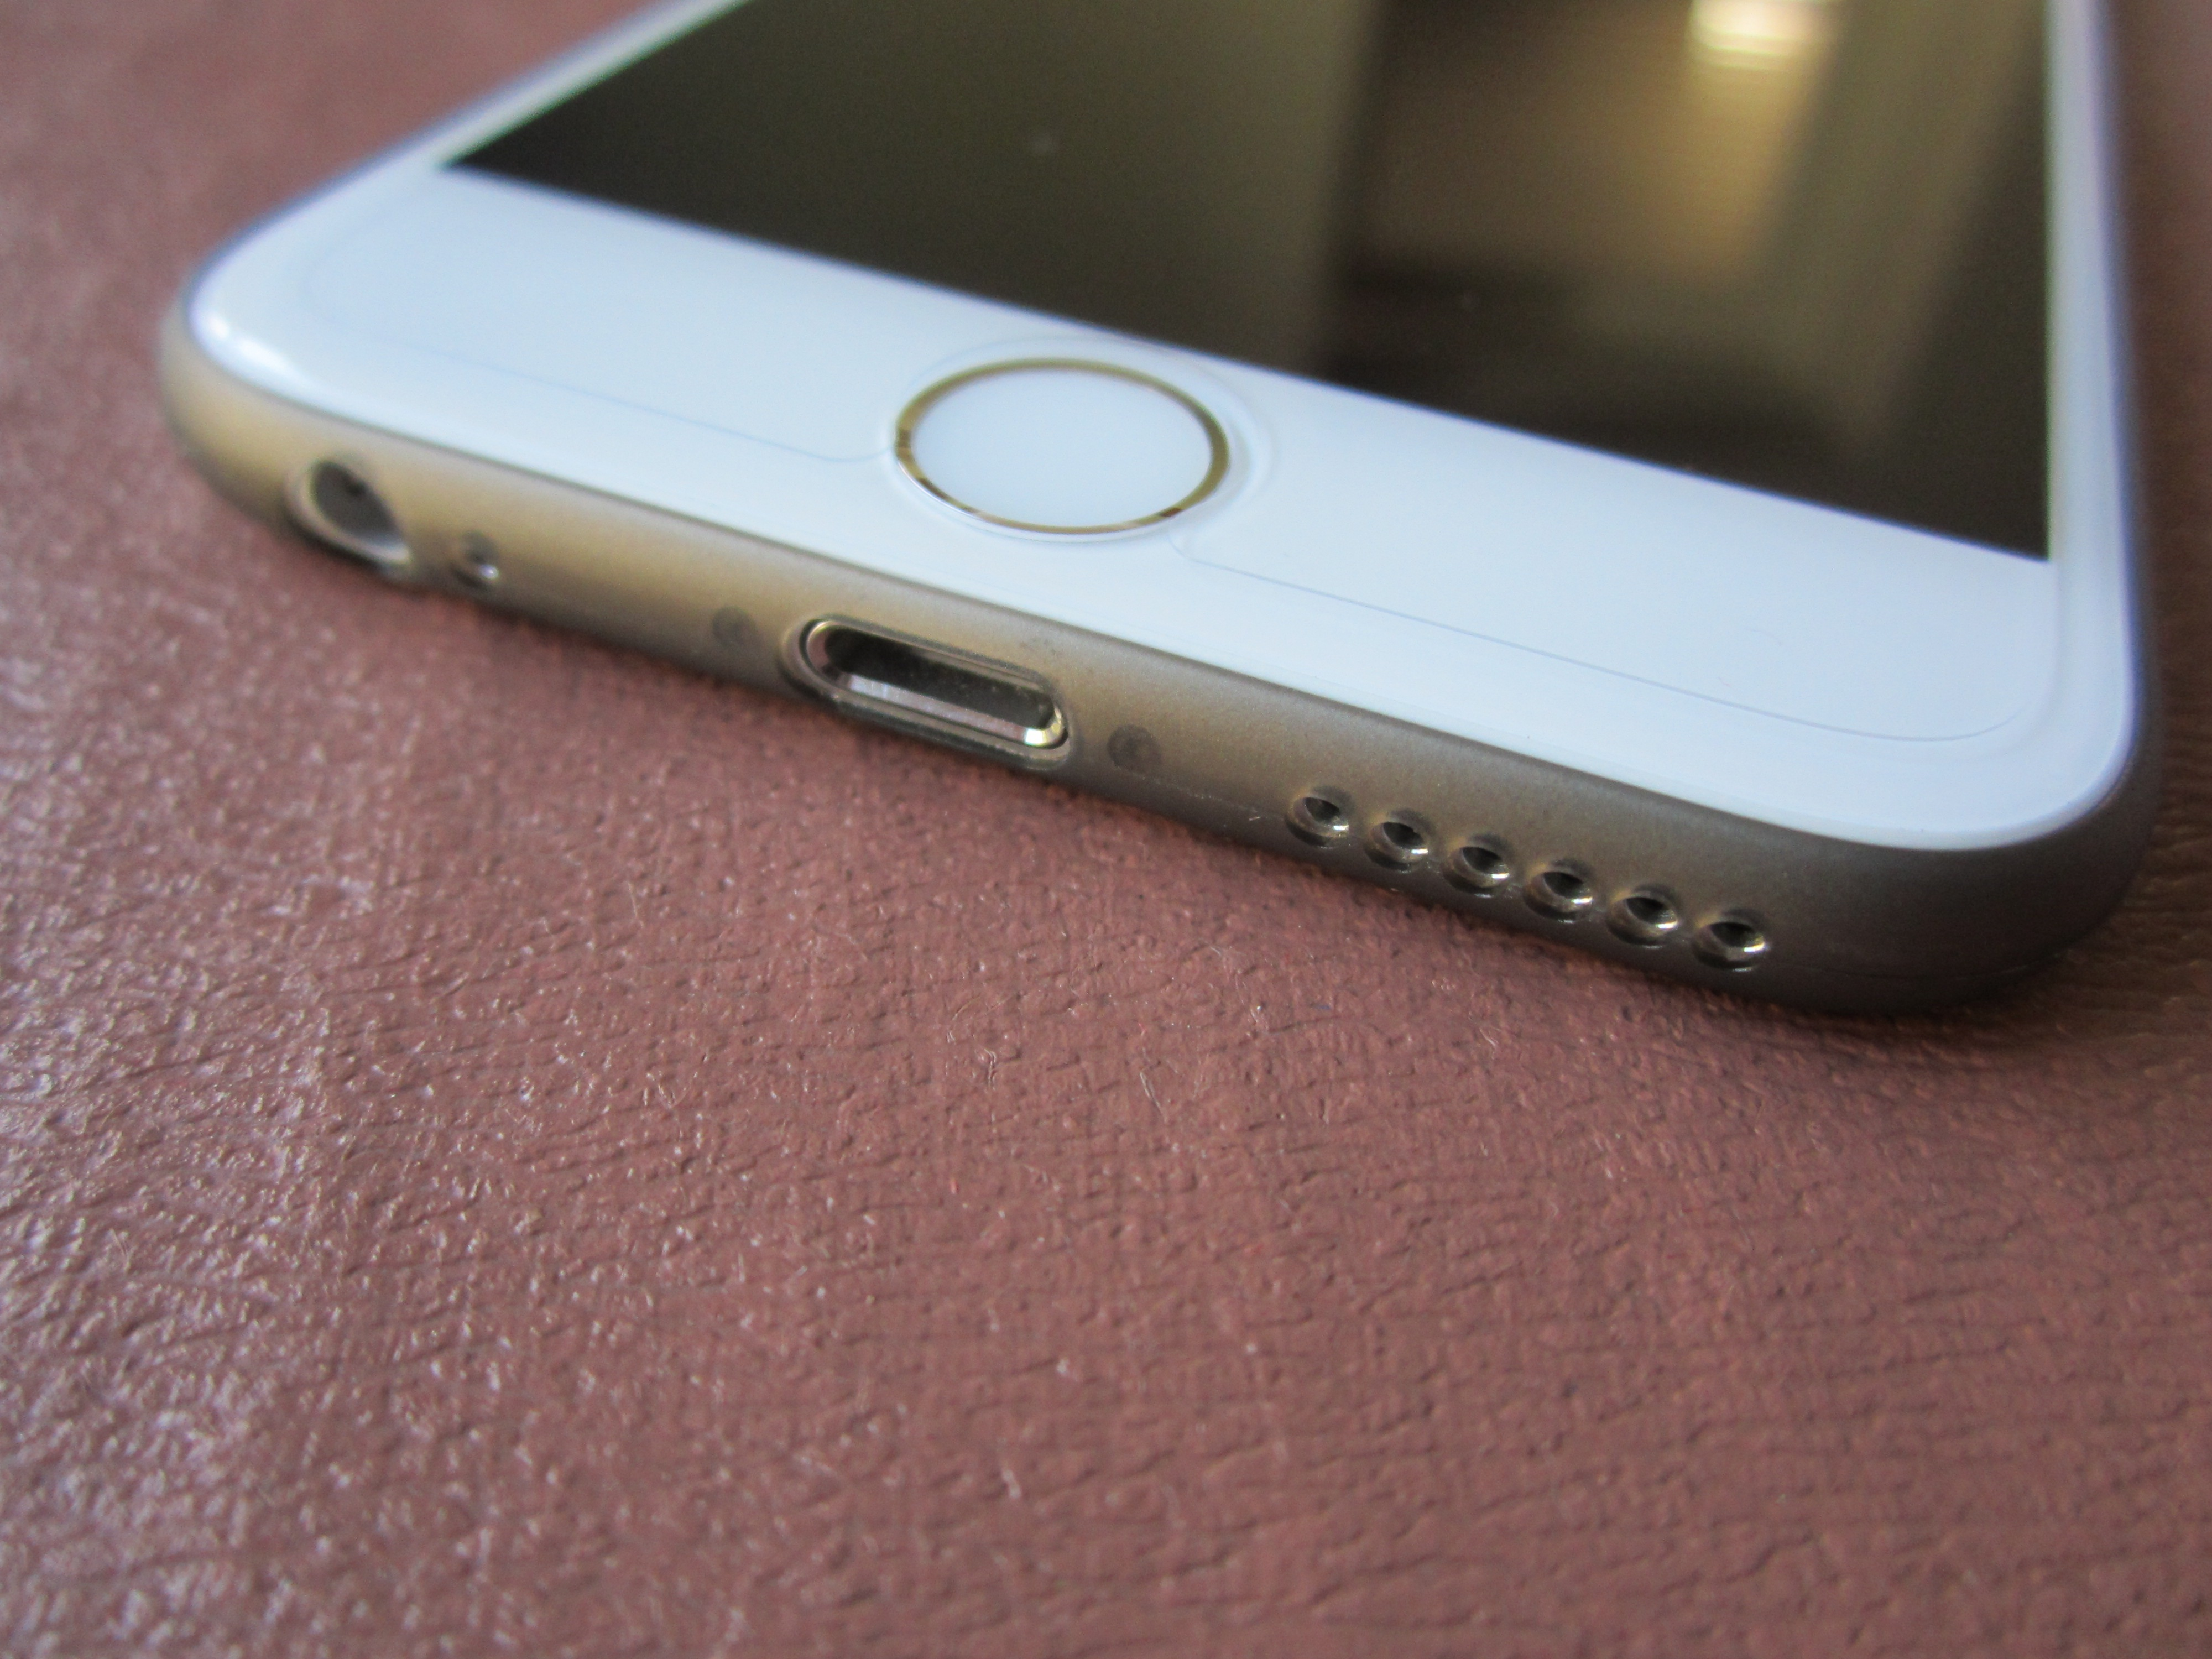 san francisco 21ca4 d8144 Shumuri Slim Case - iPhone 6 | Page 11 | MacRumors Forums